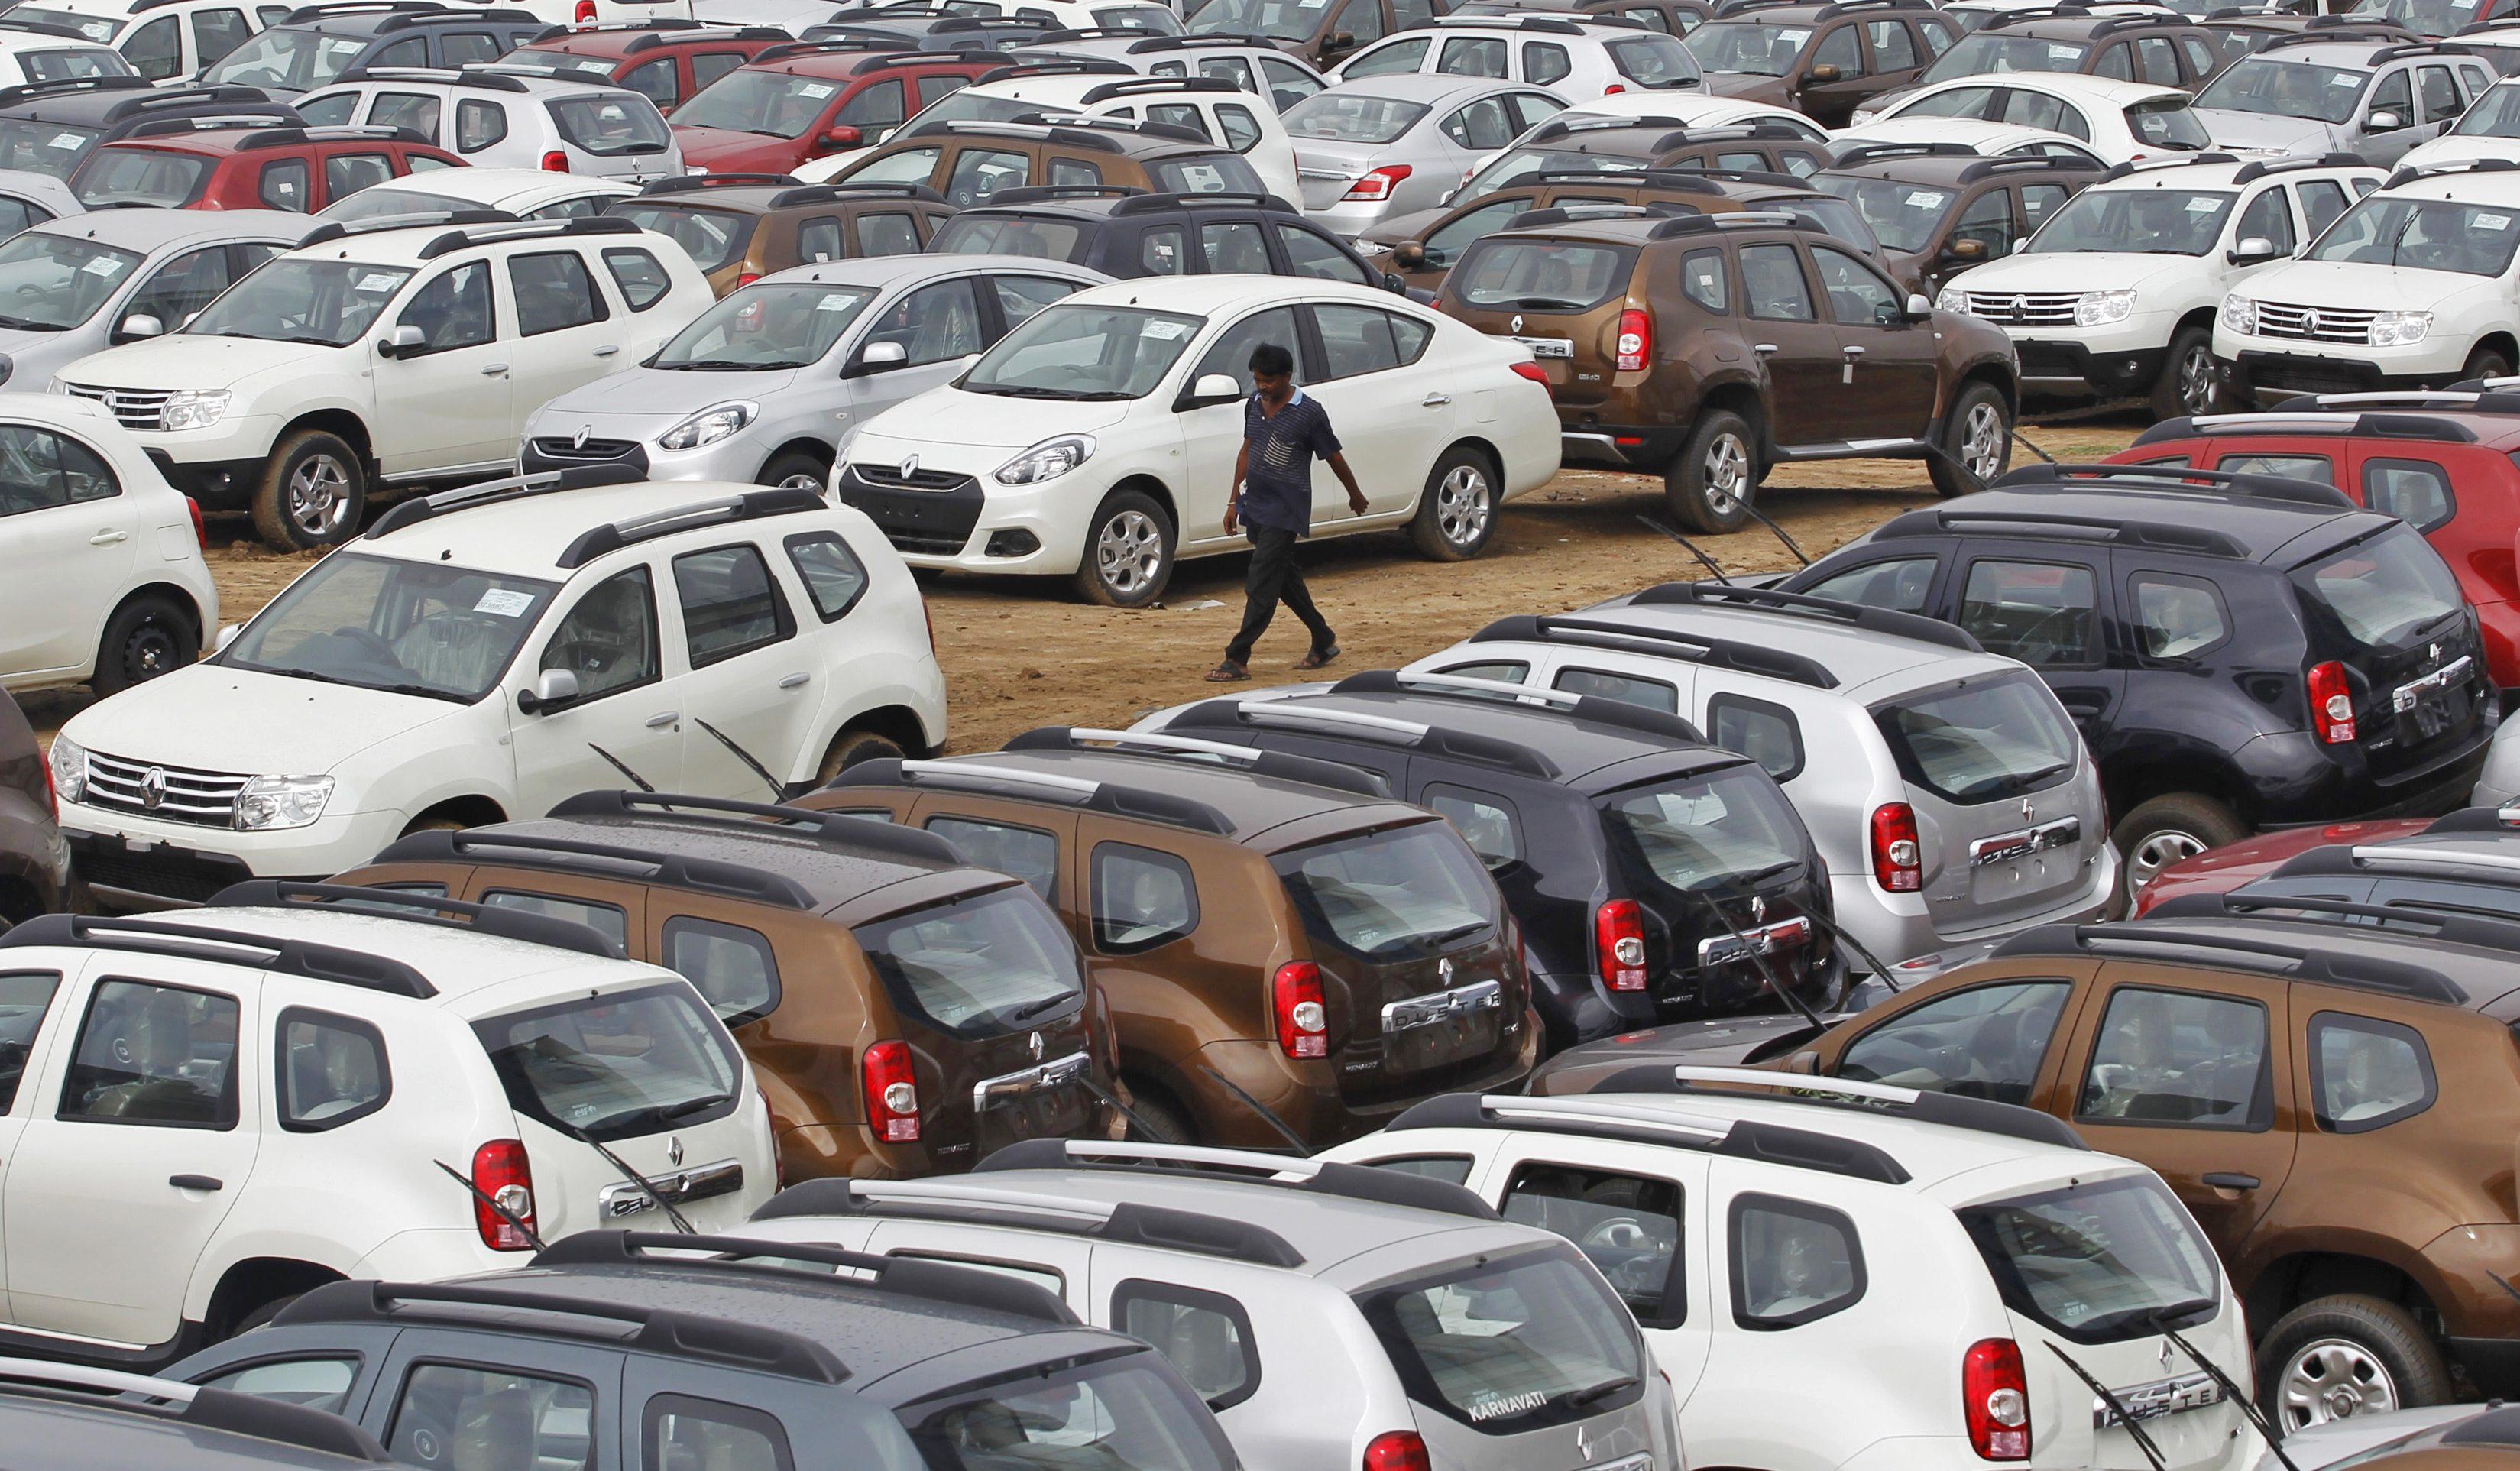 Ford India, Mahindra & Mahindra hit by semiconductor shortage — Quartz India